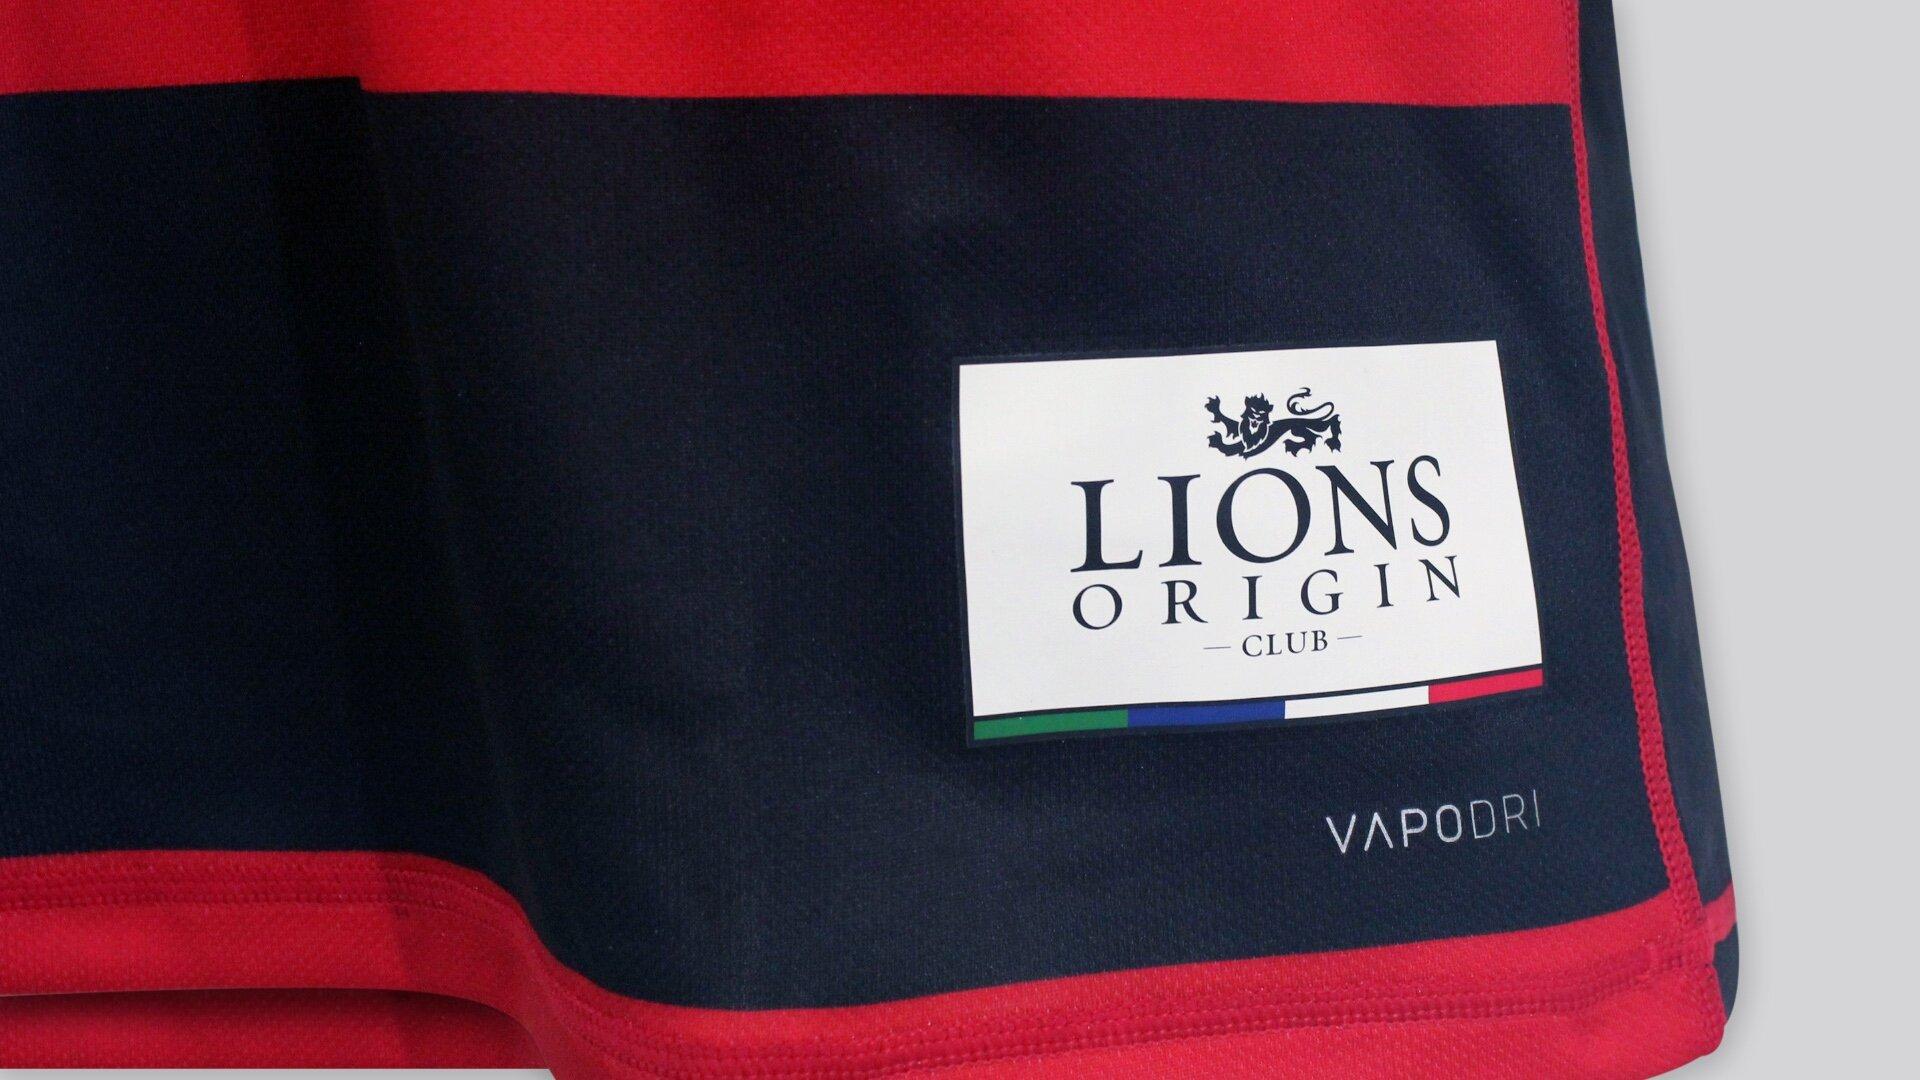 Lions Origin logo